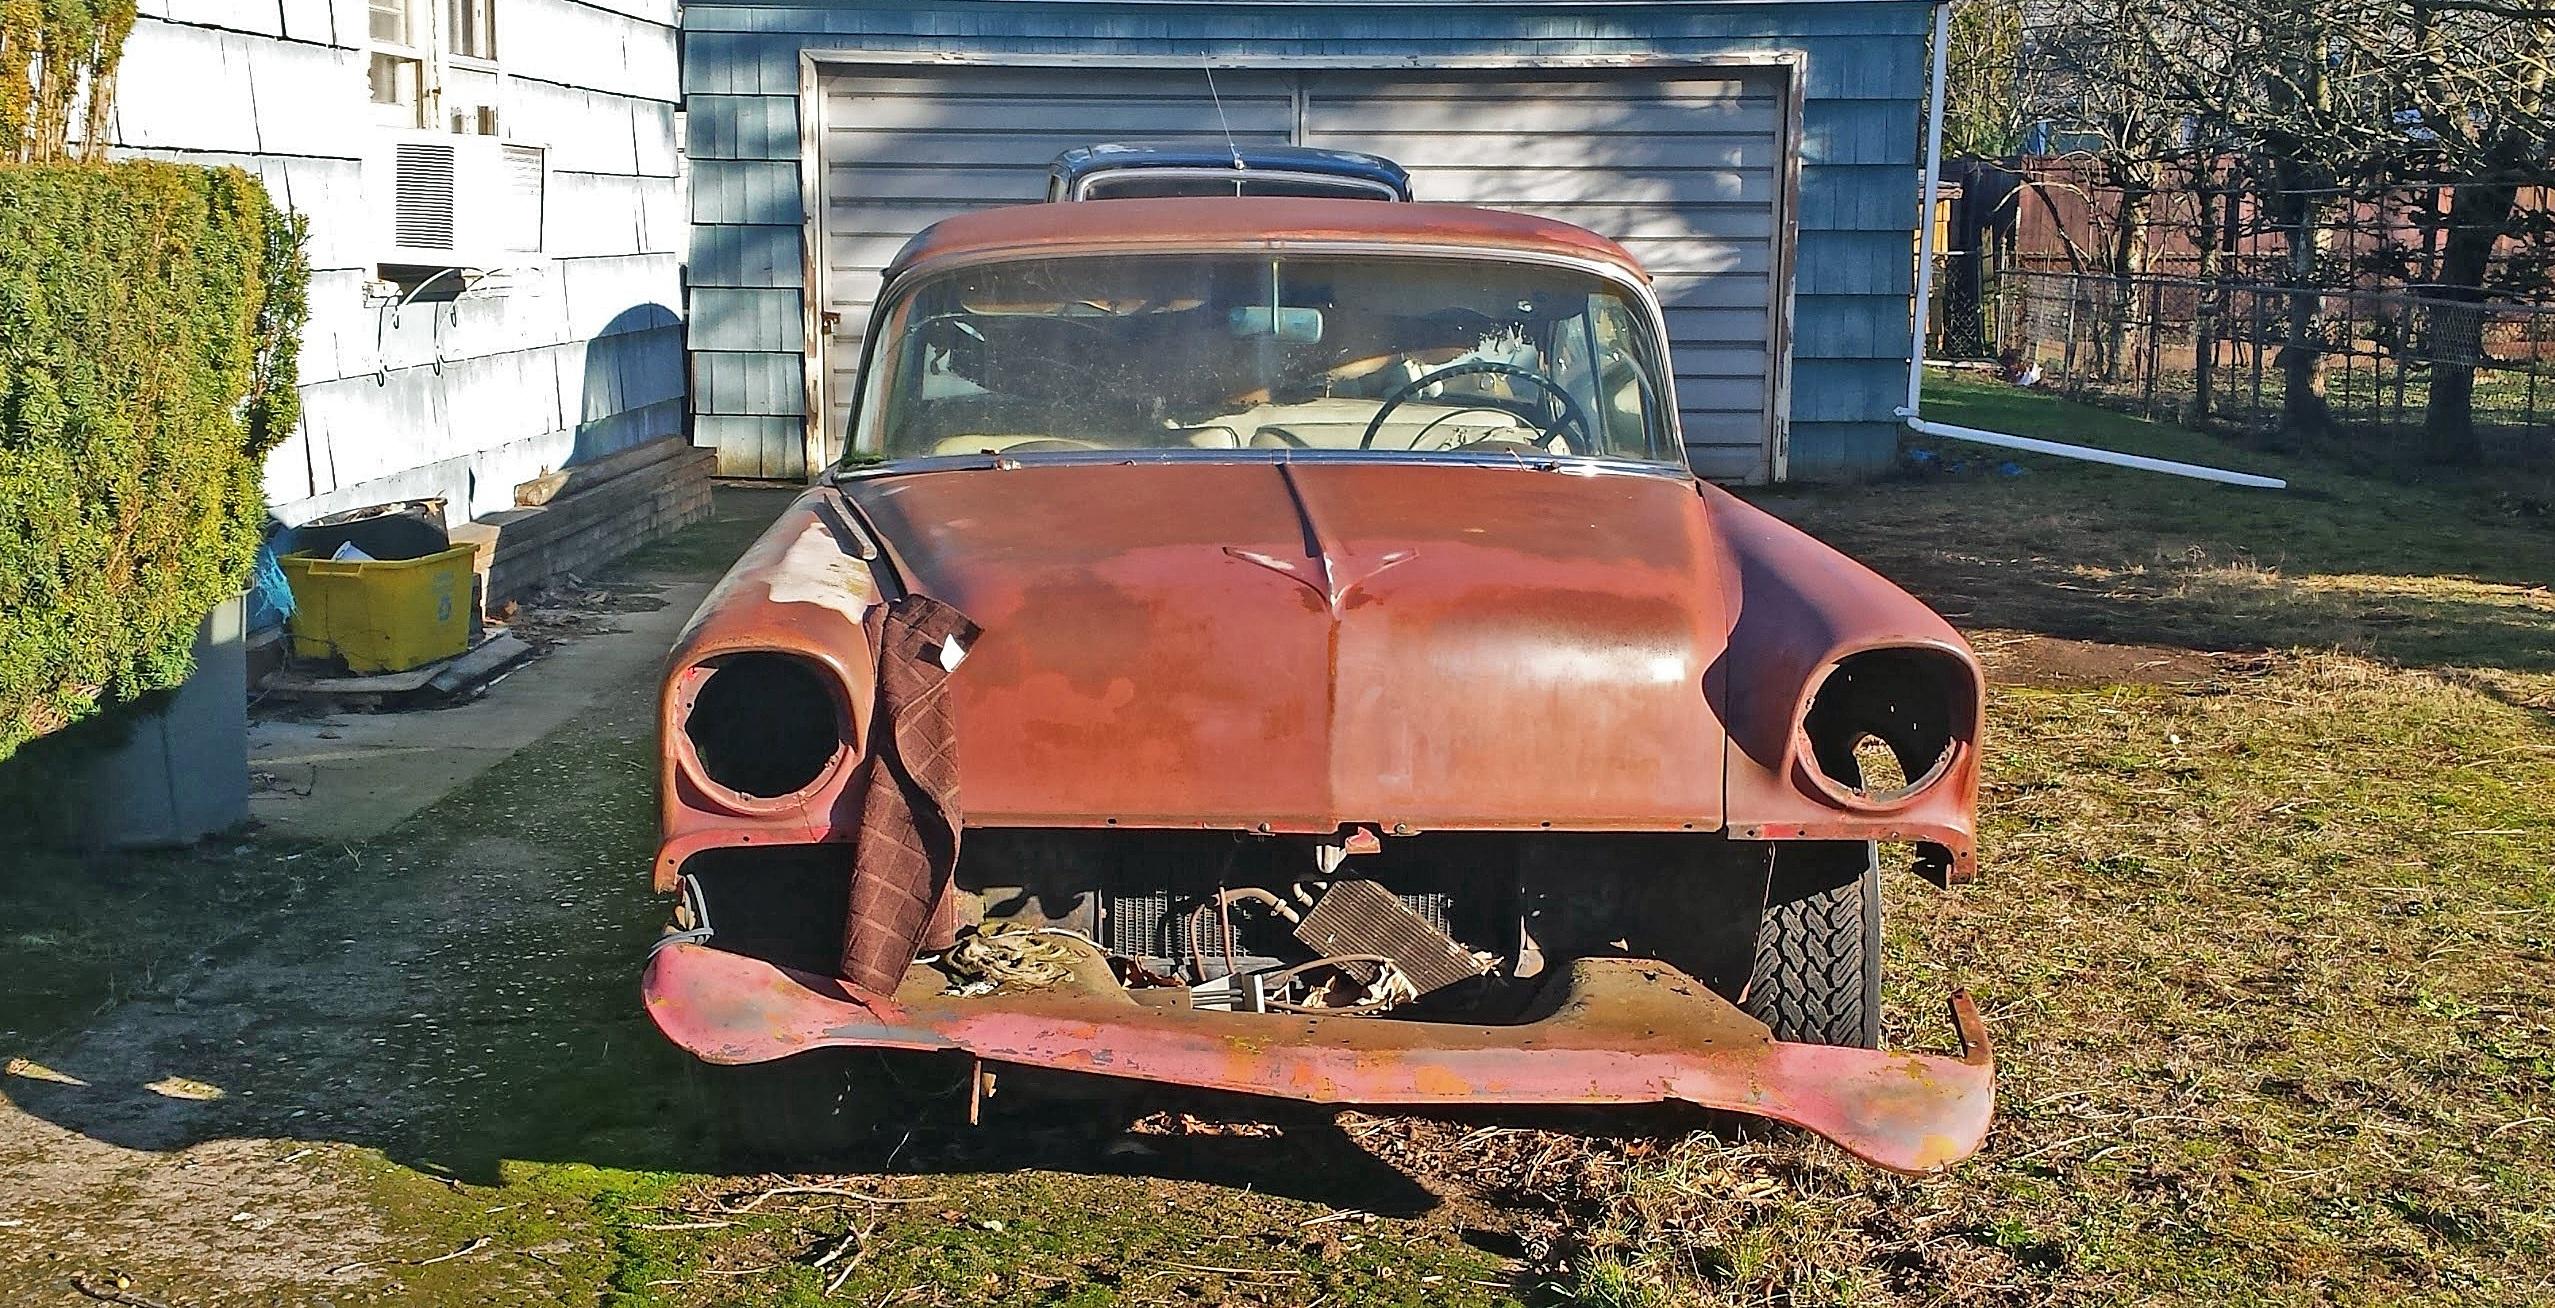 Free Images : old, rust, broken, motor vehicle, vintage car, project ...